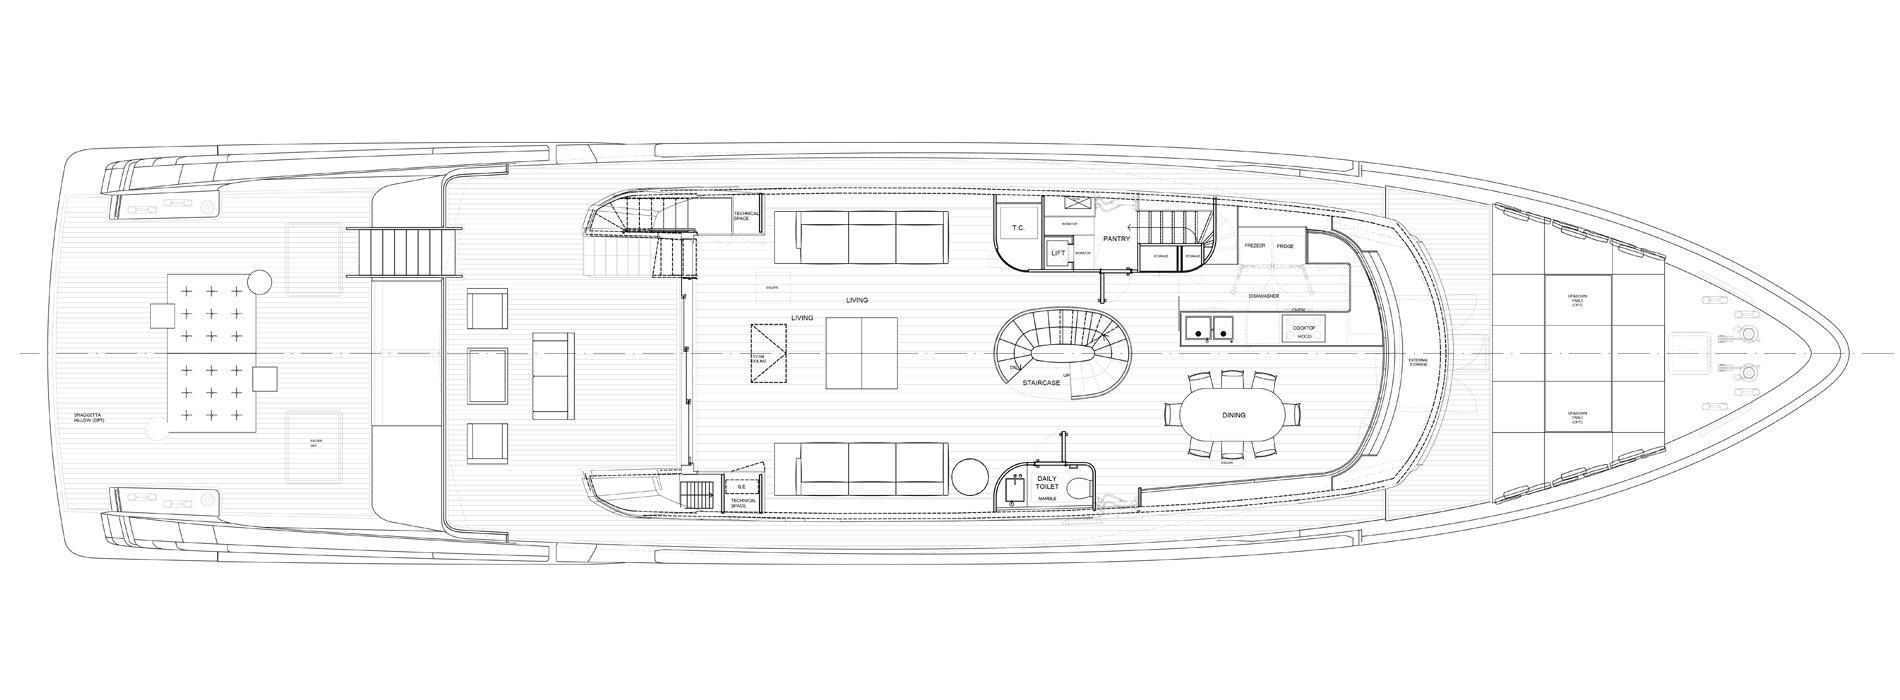 Sanlorenzo Yachts SX112 Hauptdeck Ausführung B